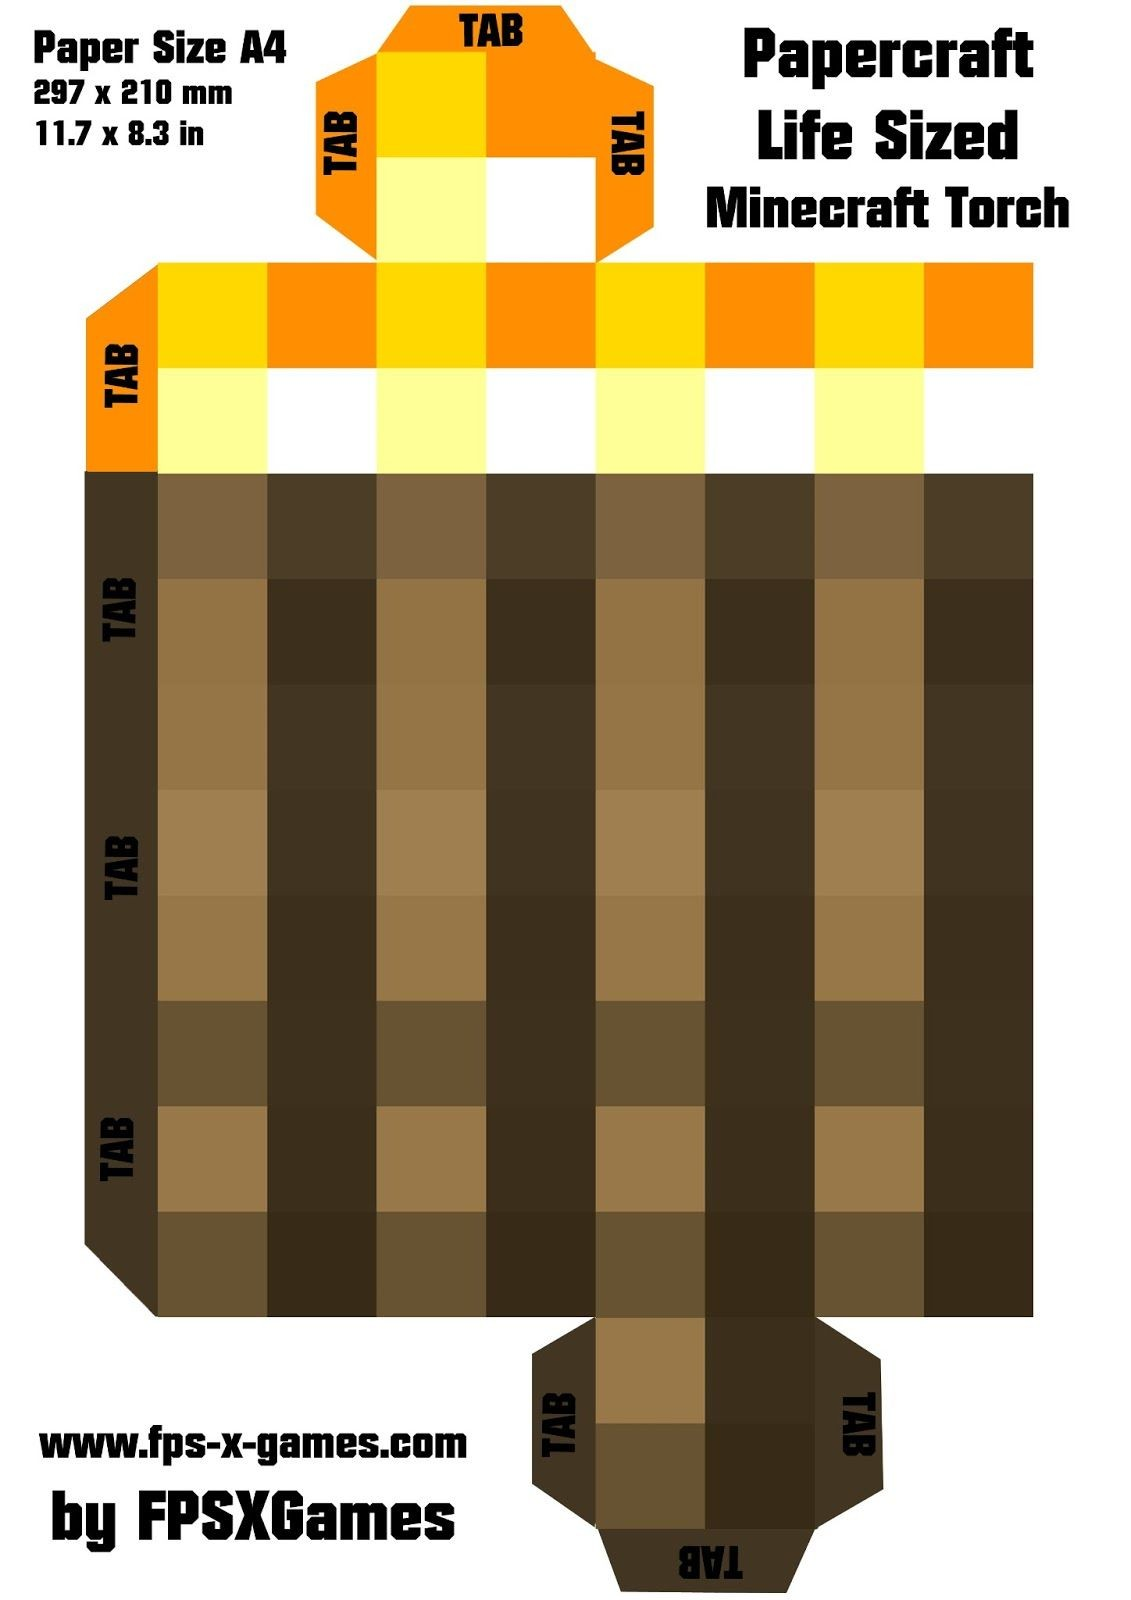 Printable Pixel Papercraft